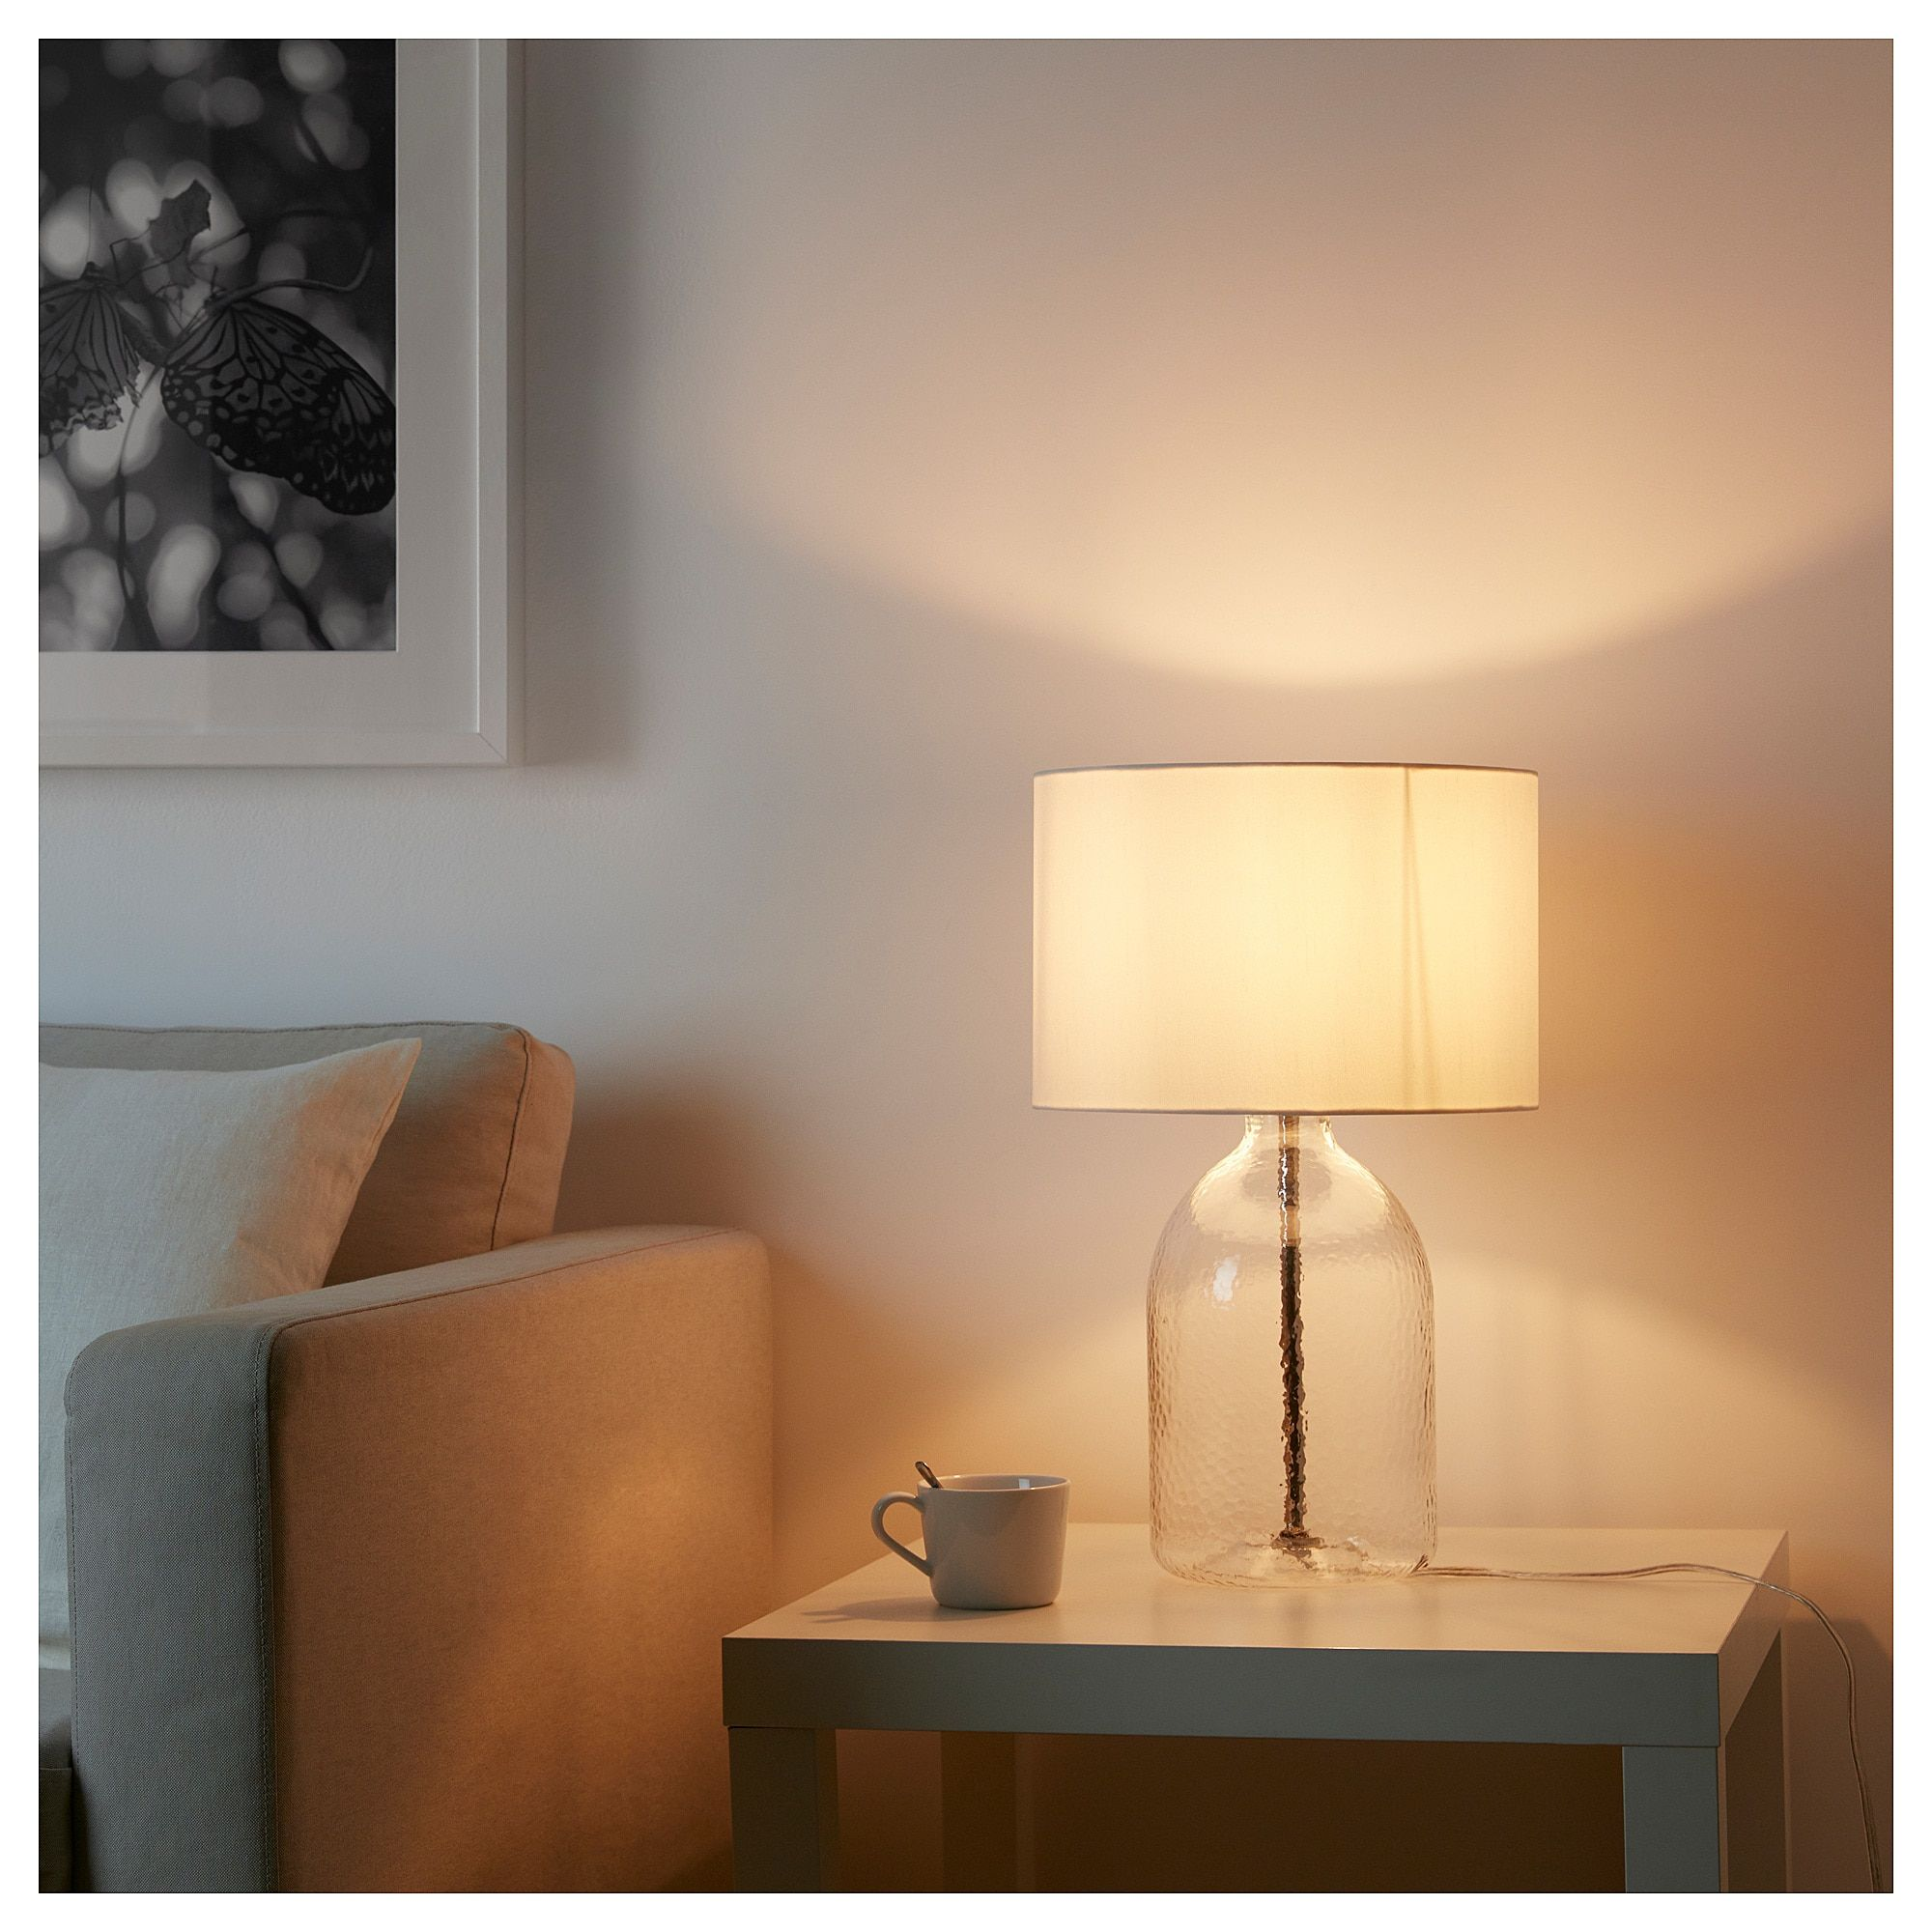 Allanit Table Lamp White Glass Bedroom Table Lamp Ikea White